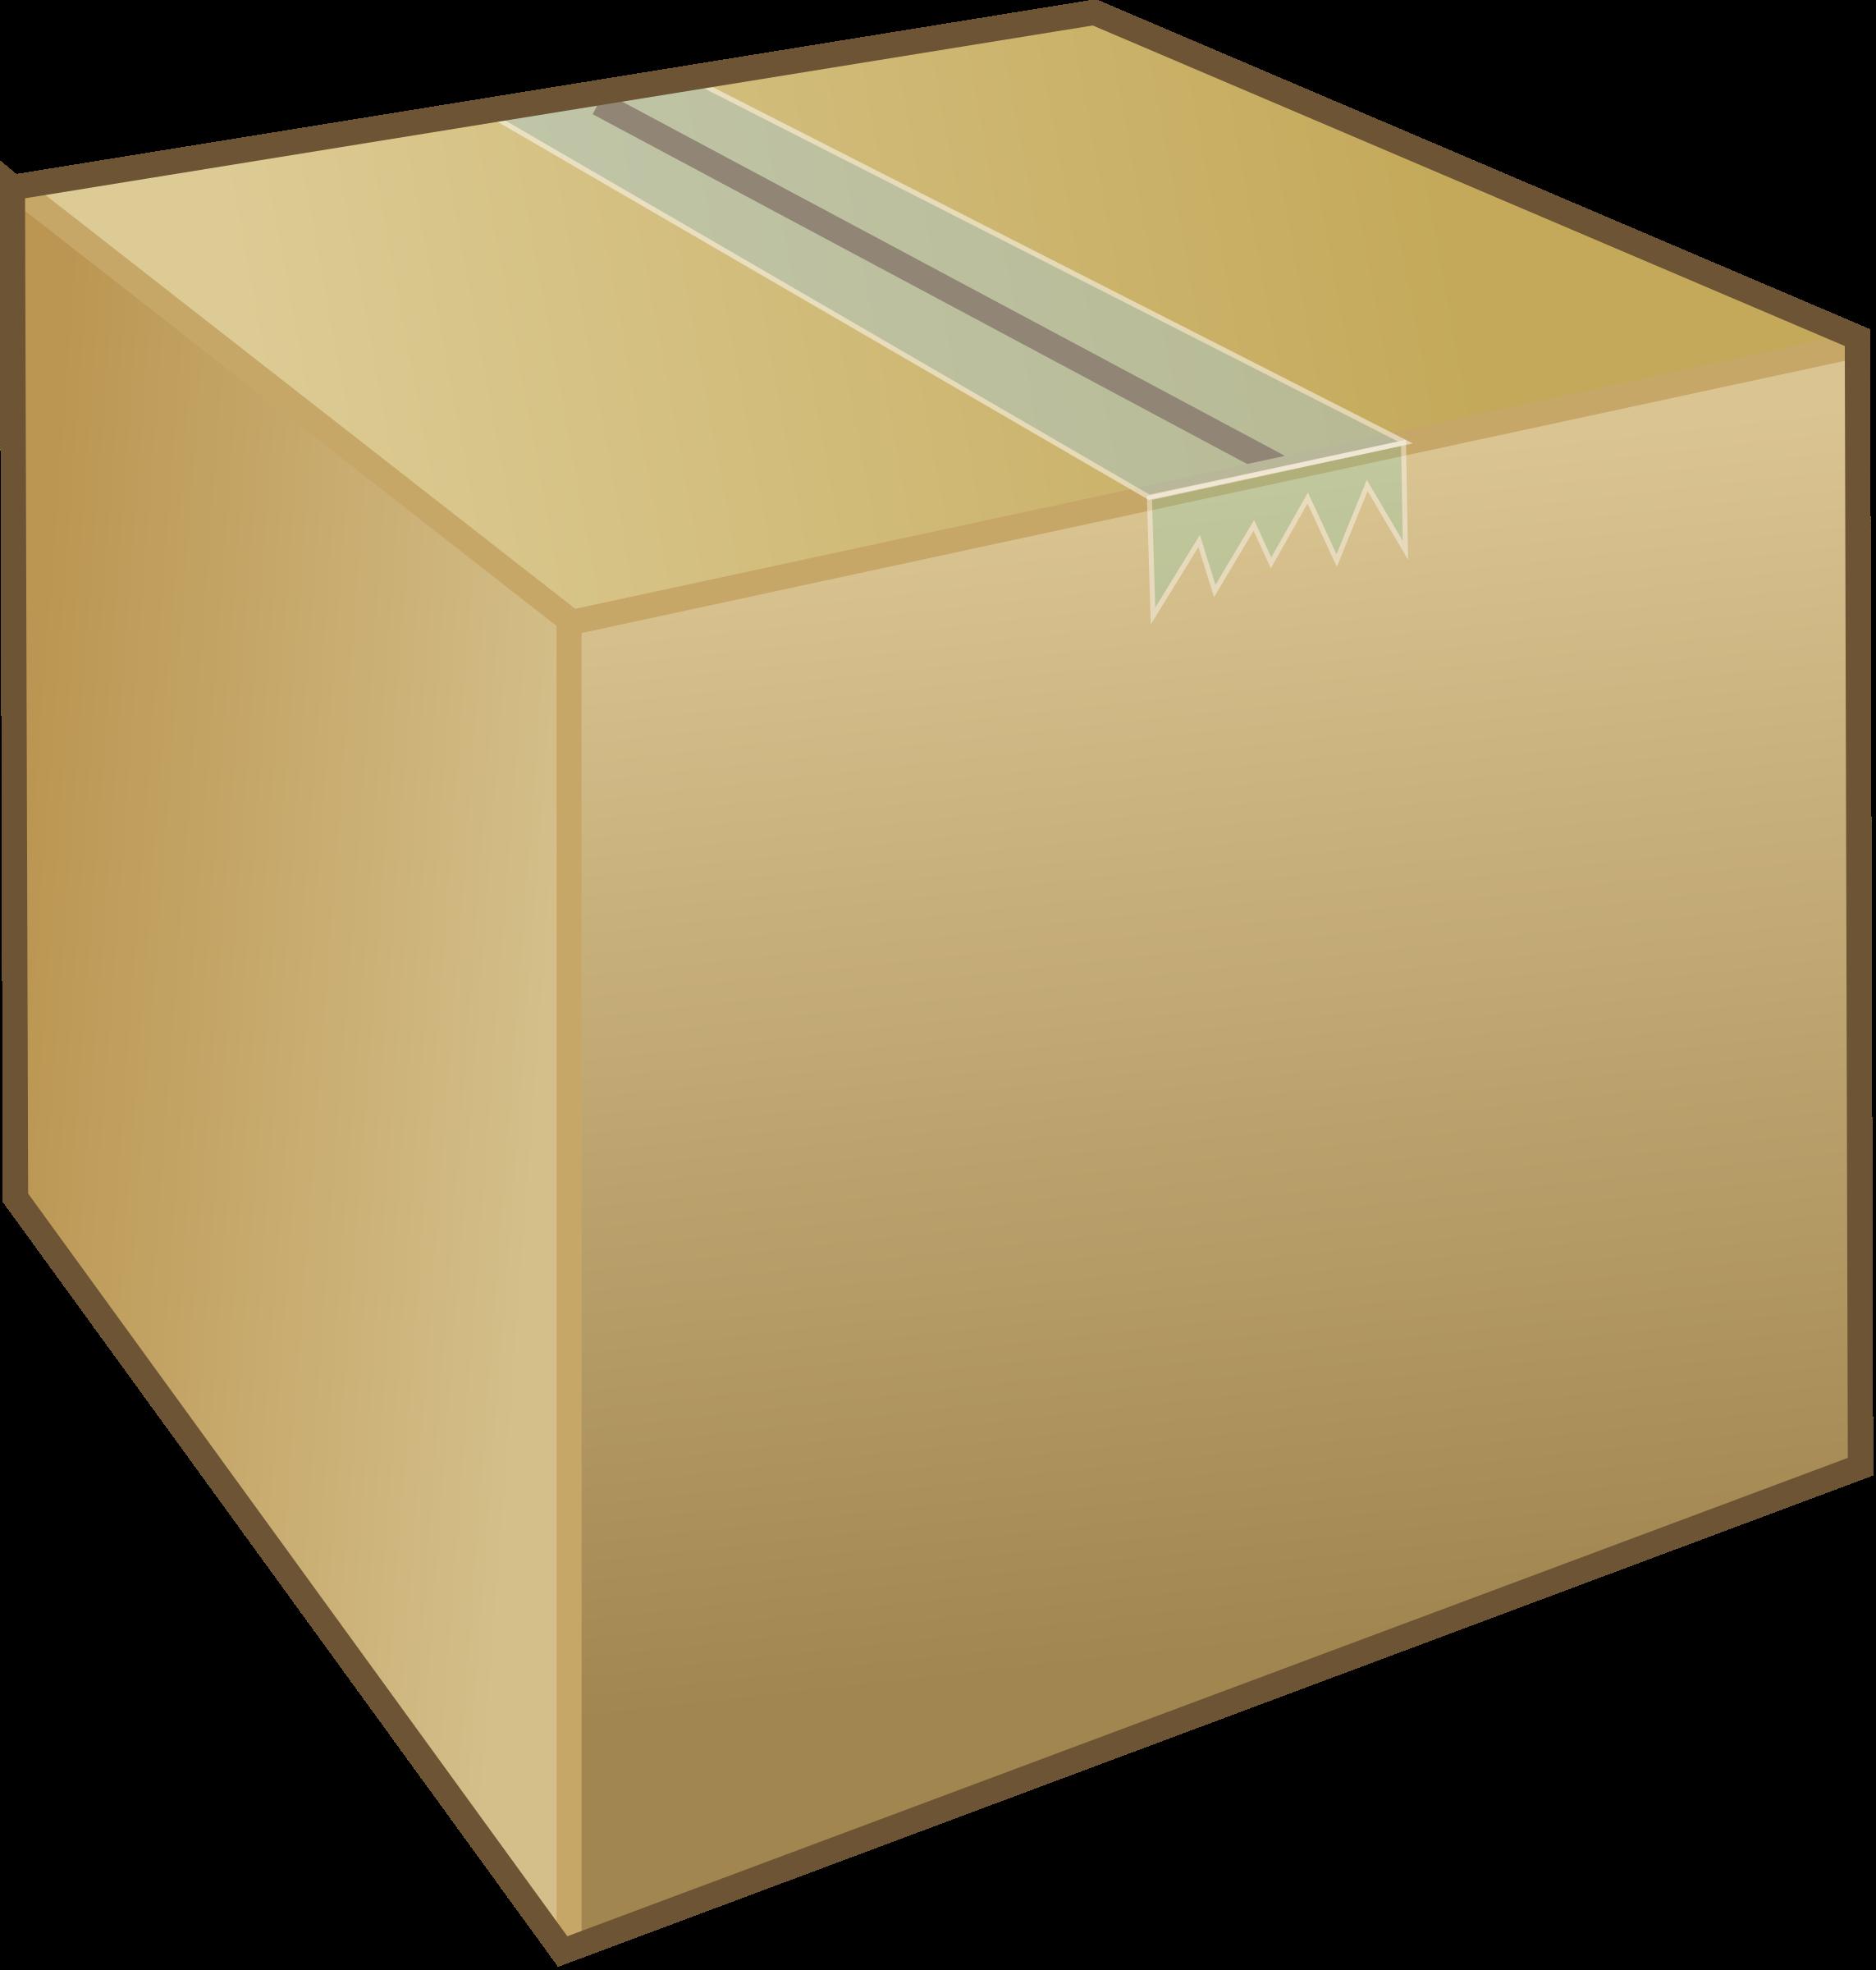 collection of transparent. Clipart box carton box